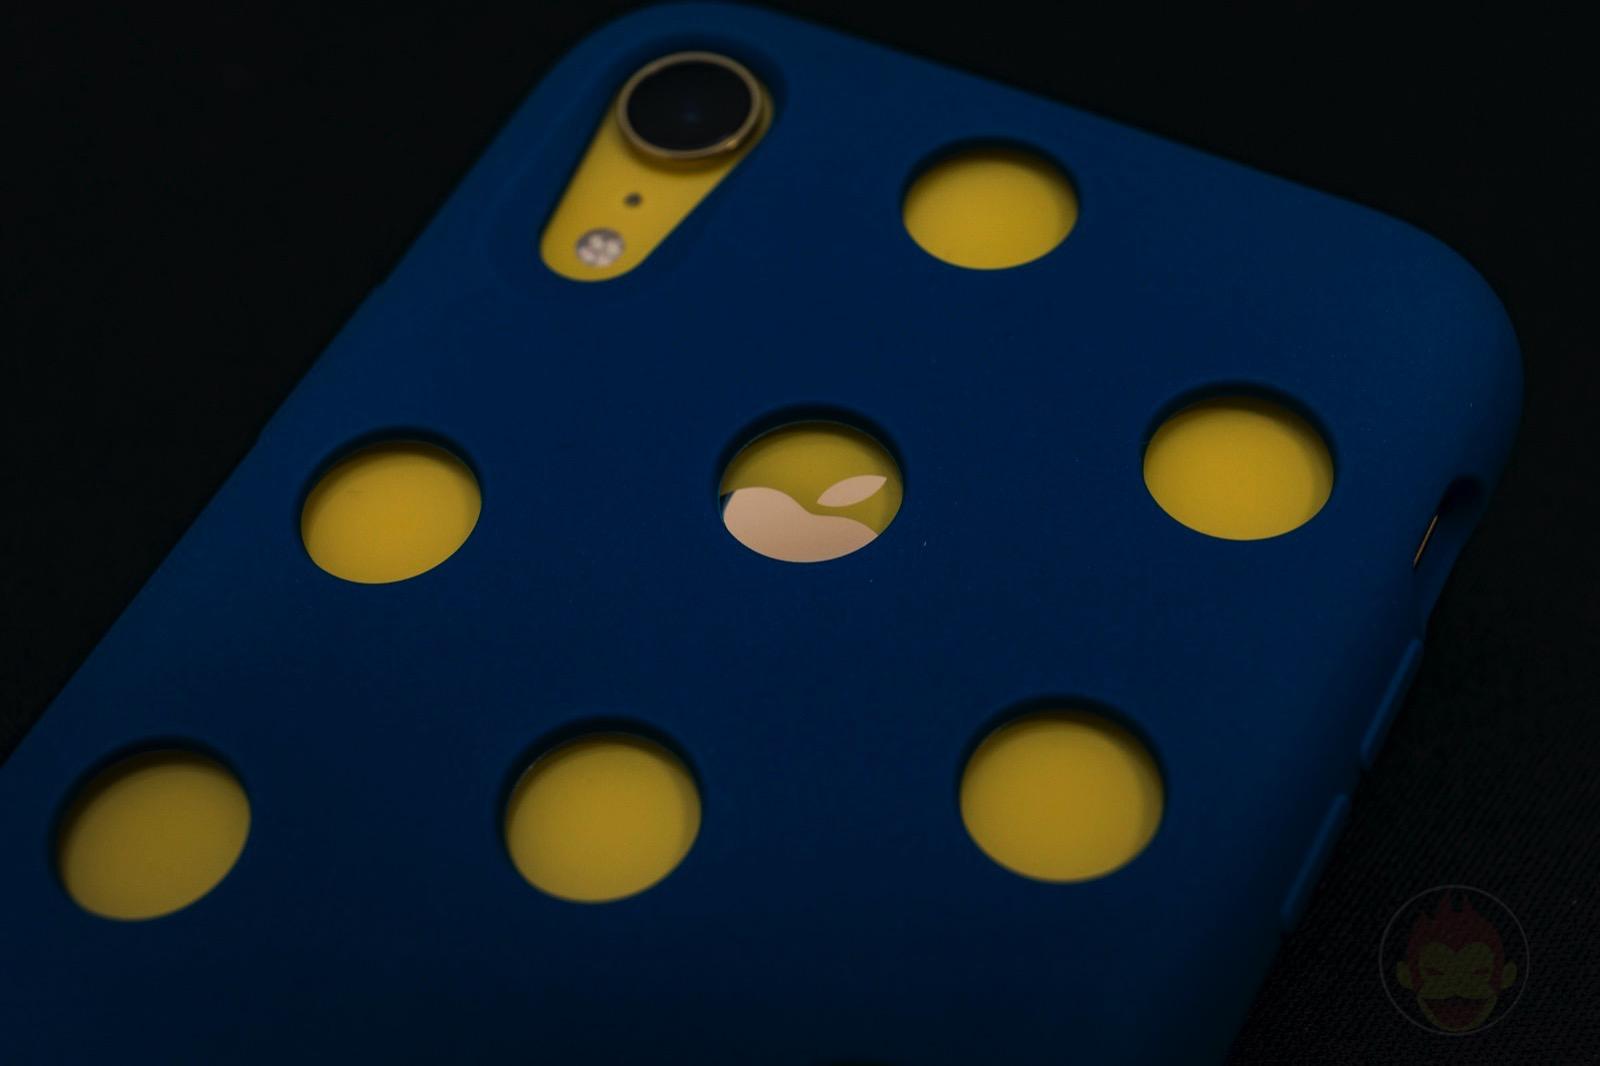 AndMesh-Layer-Case-Cobalt-Blue-for-iPhoneXR-02.jpg